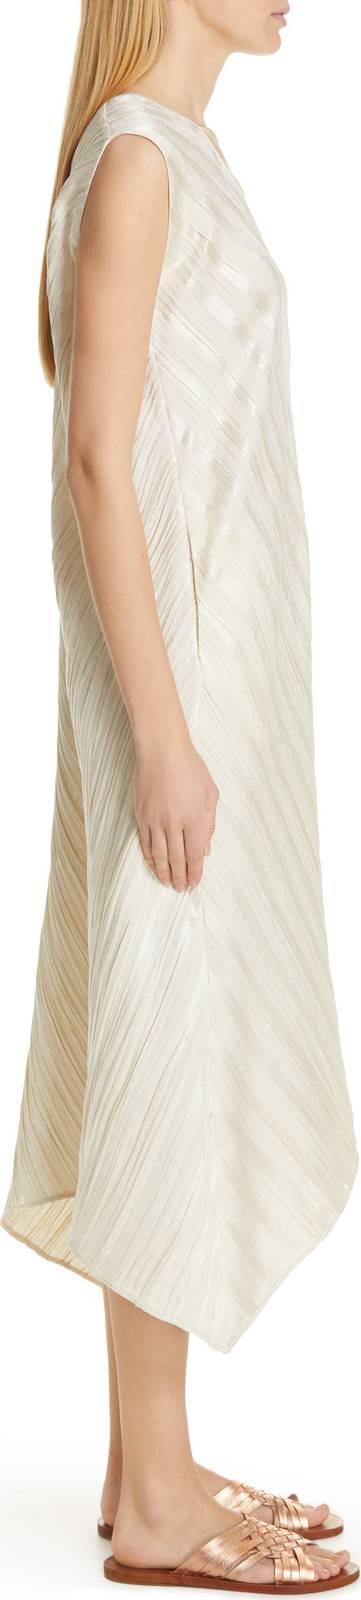 ZERO + MARIA CORNEJO Foulard Plisse Linen & Silk Dress